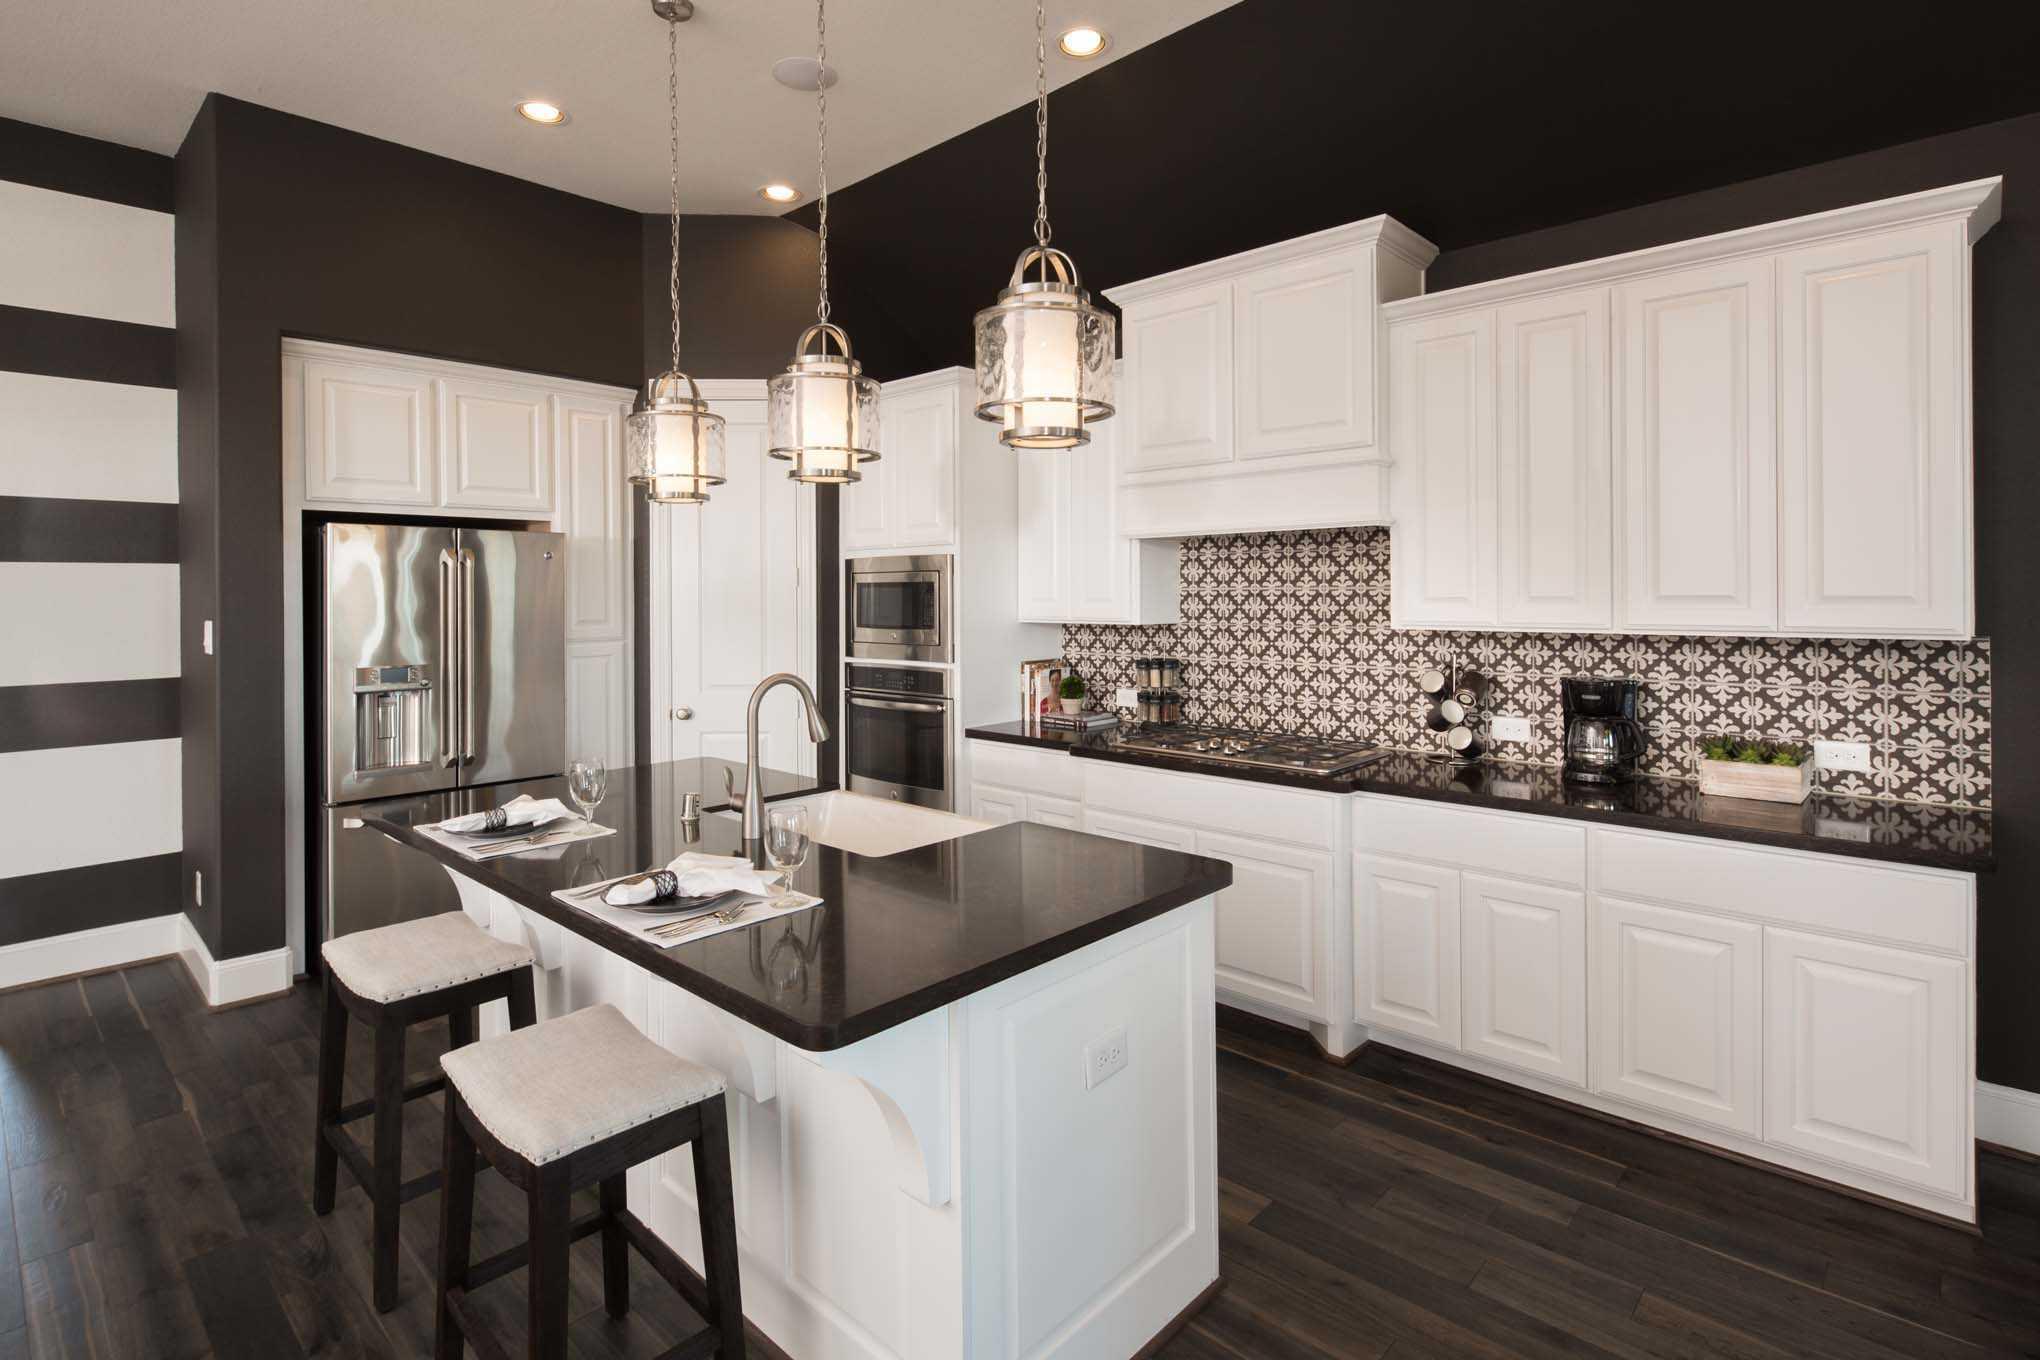 Kitchen-in-Plan 204-at-Pomona: 65ft. lots-in-Manvel